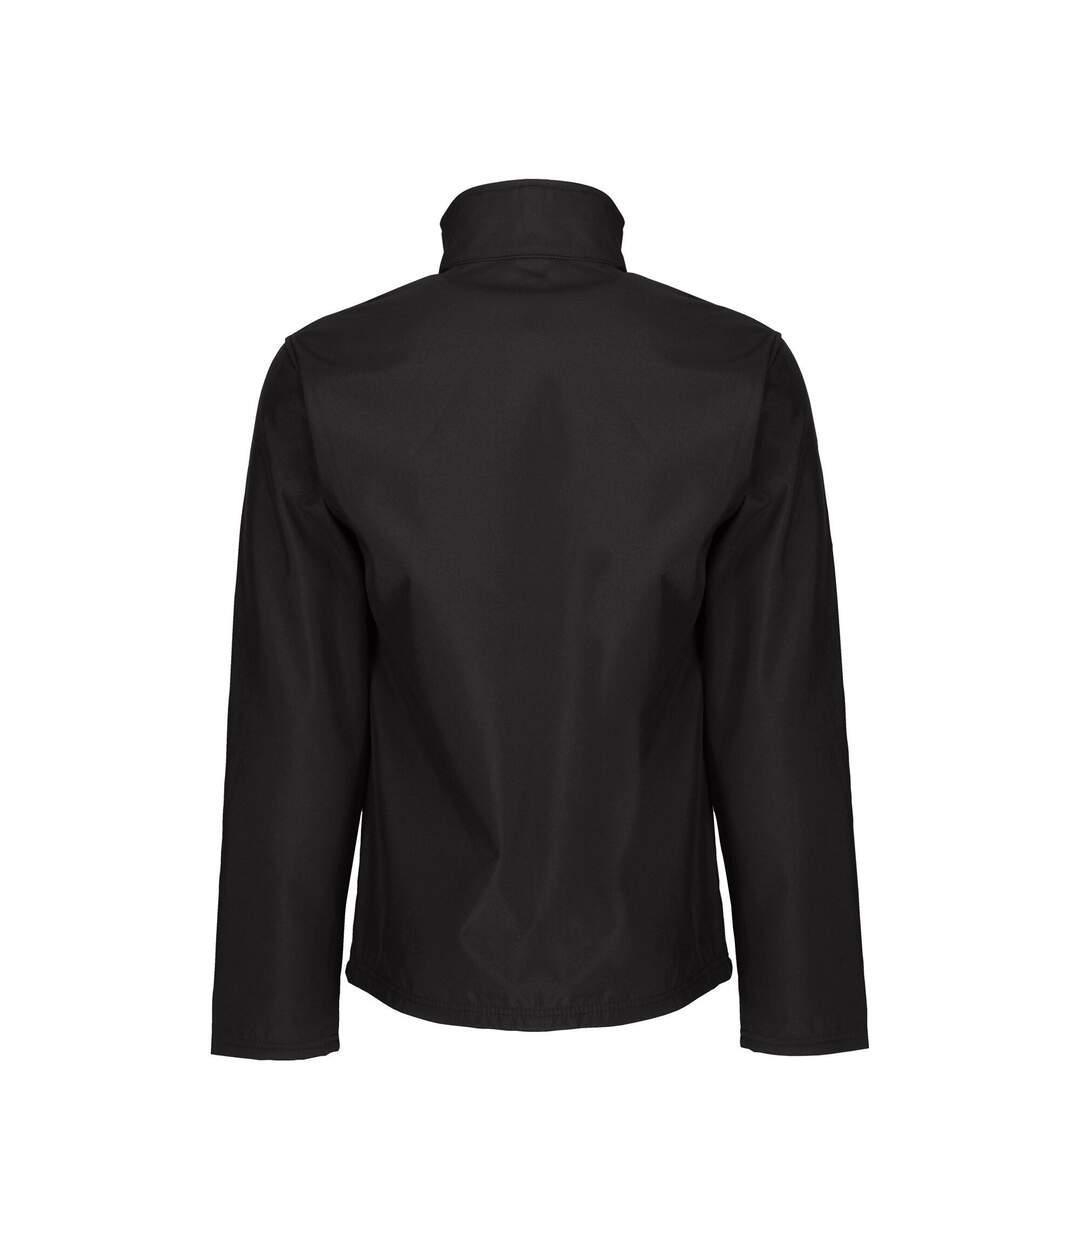 Regatta Professional Mens Octagon II Waterproof Softshell Jacket (Black/Black) - UTRG2164